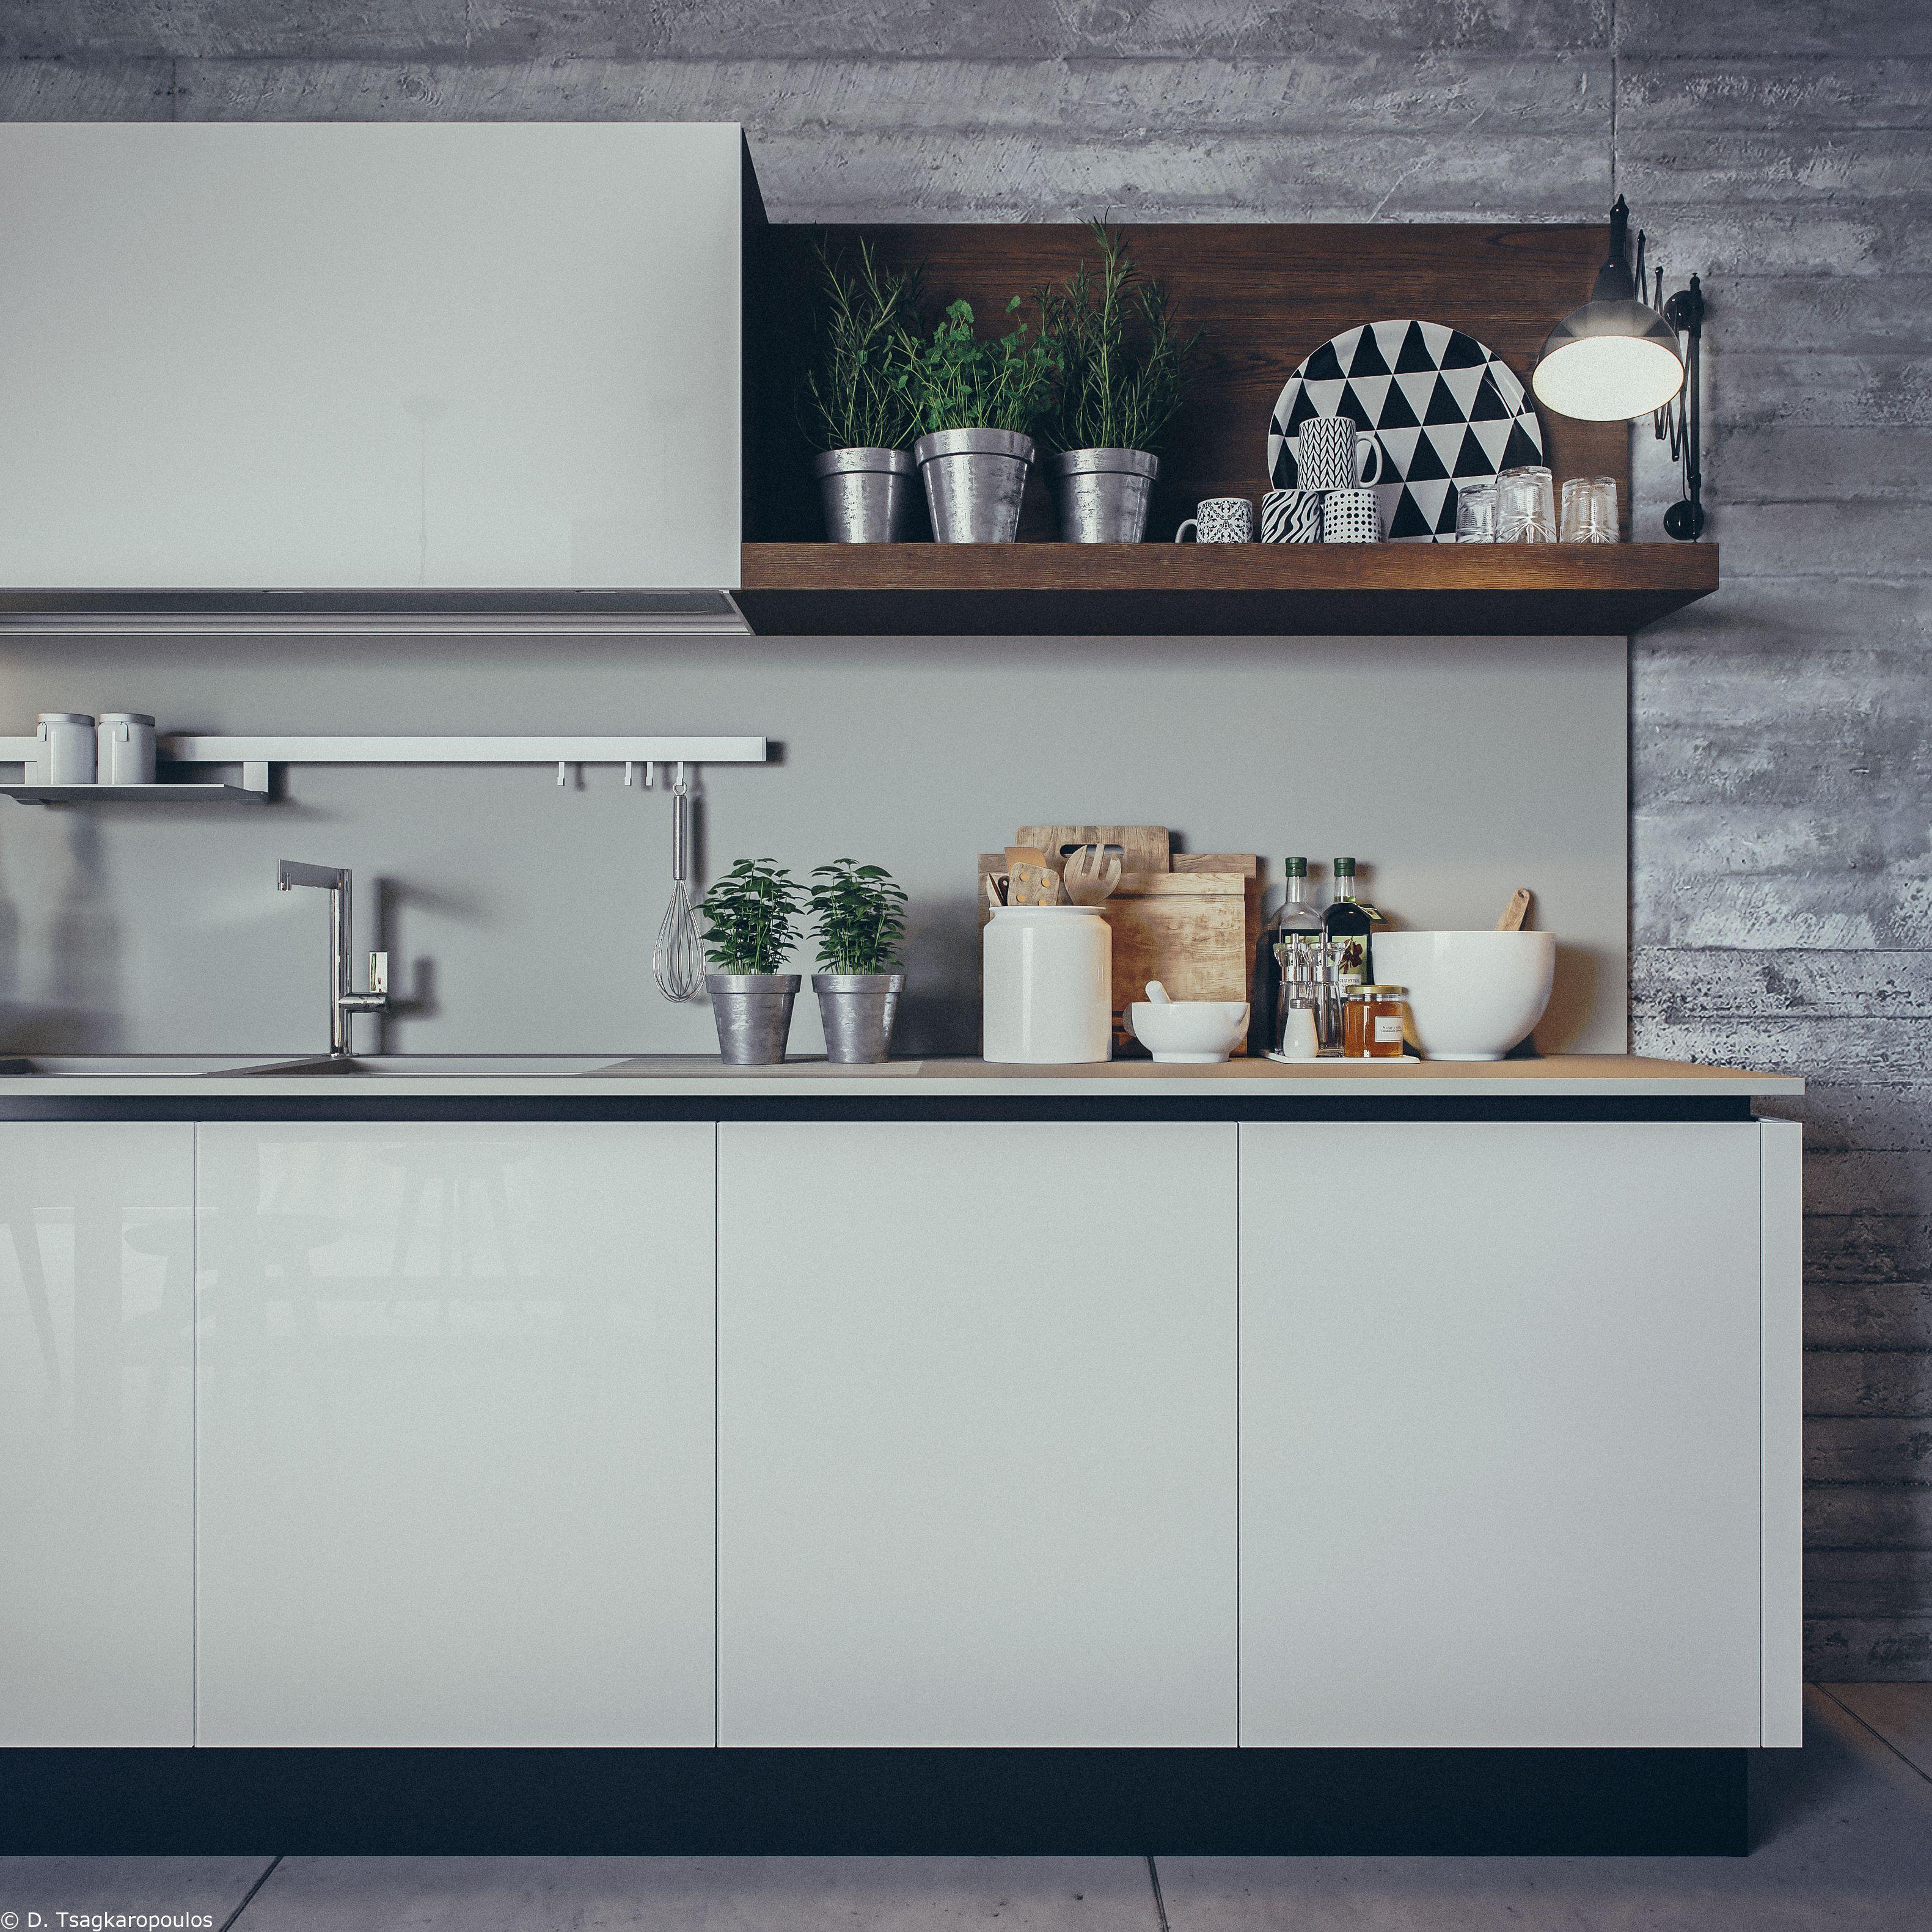 Record è Cucine on Behance | KITCHEN | Pinterest | Interiors and ...